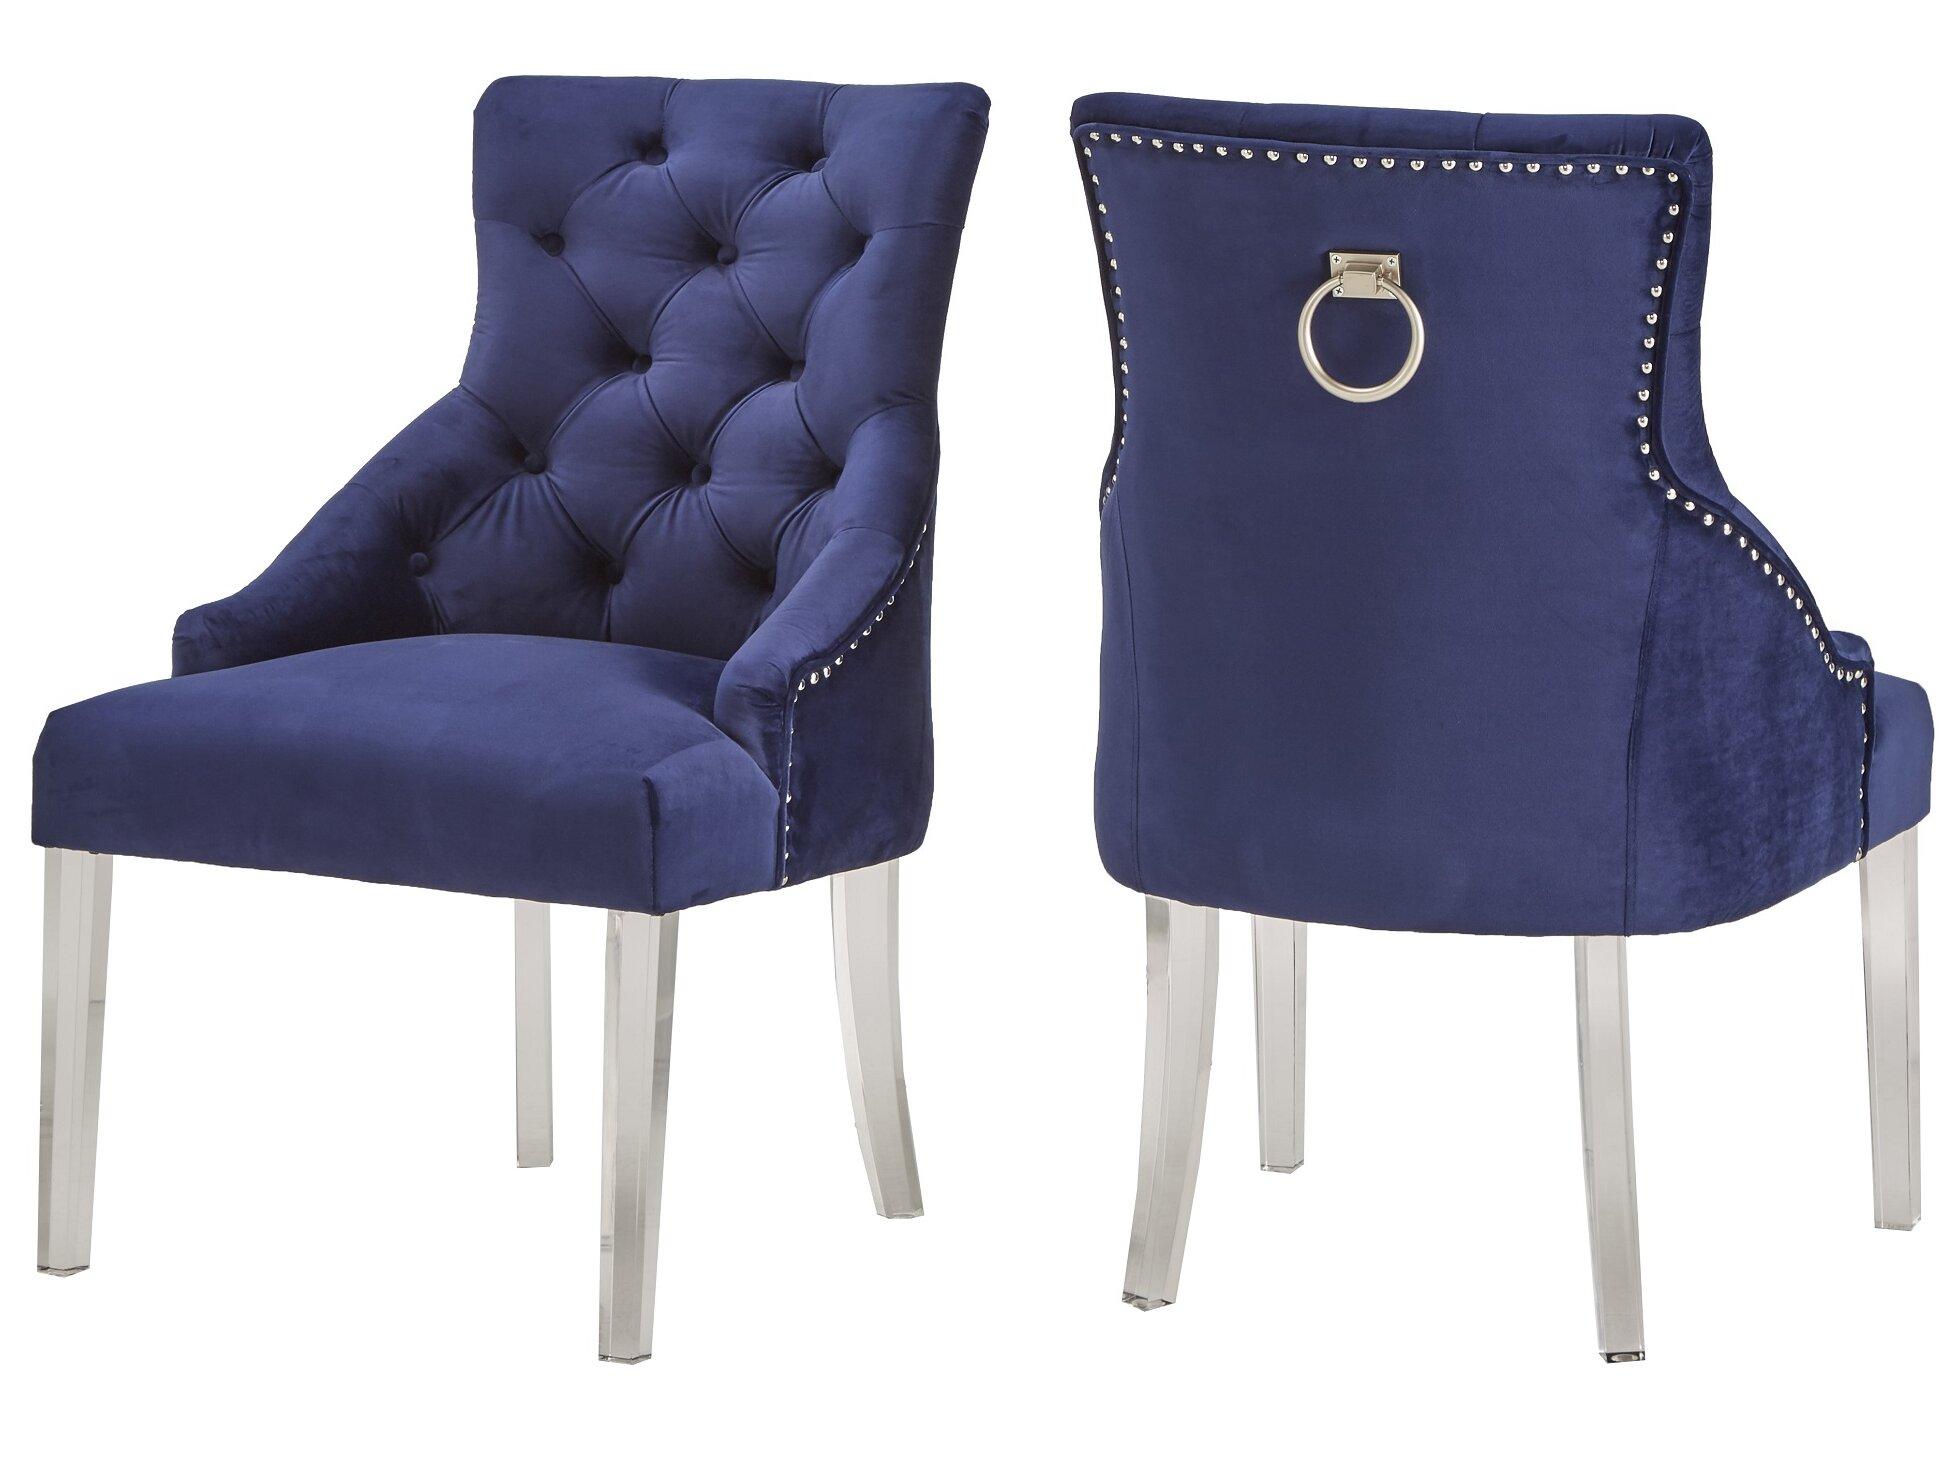 Rosdorf Park Seville Upholstered Dining Chair Reviews Wayfair